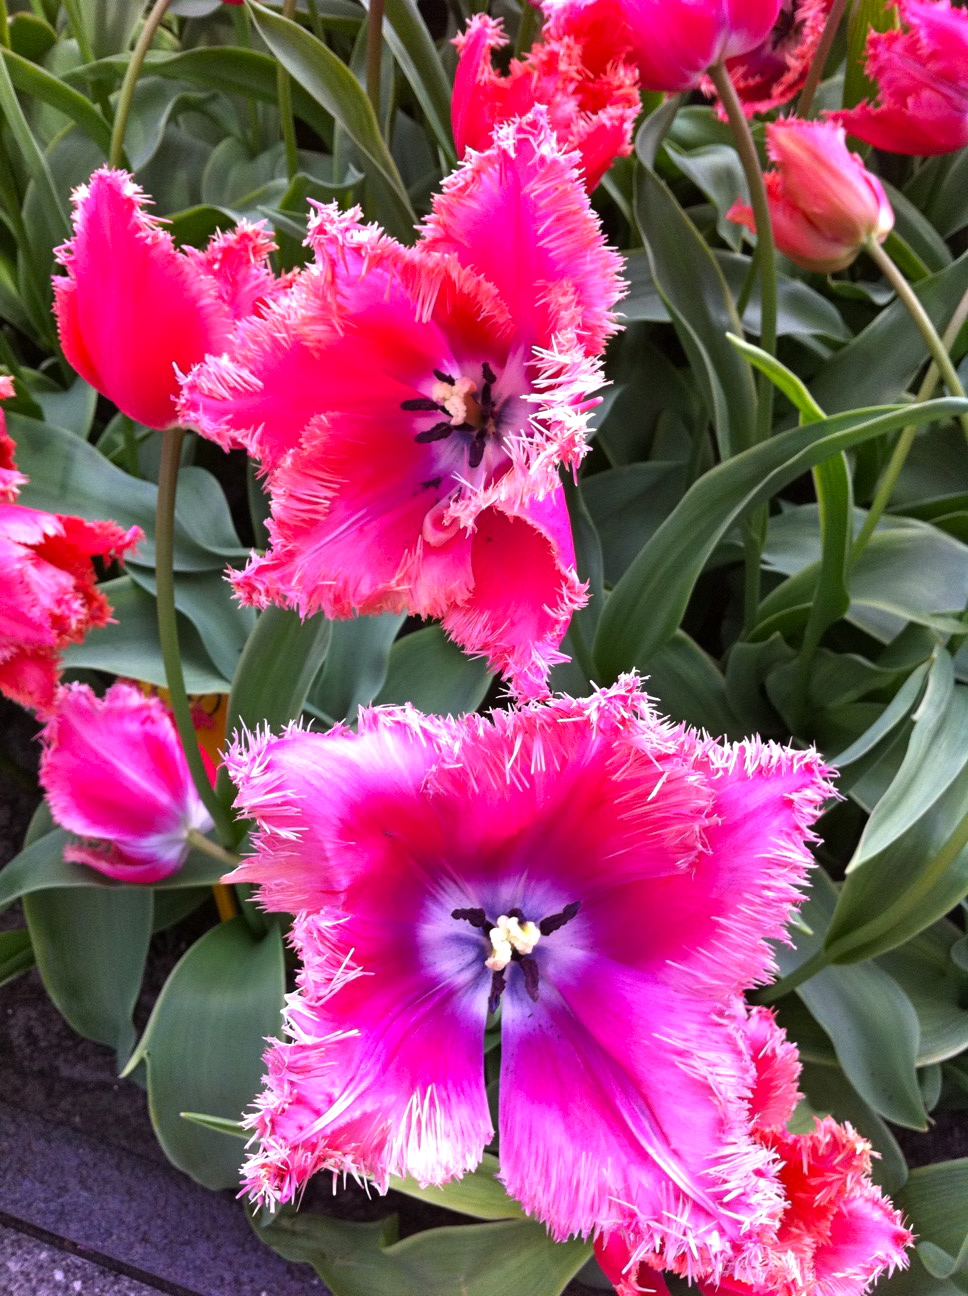 2011-04-22-photo39.jpg